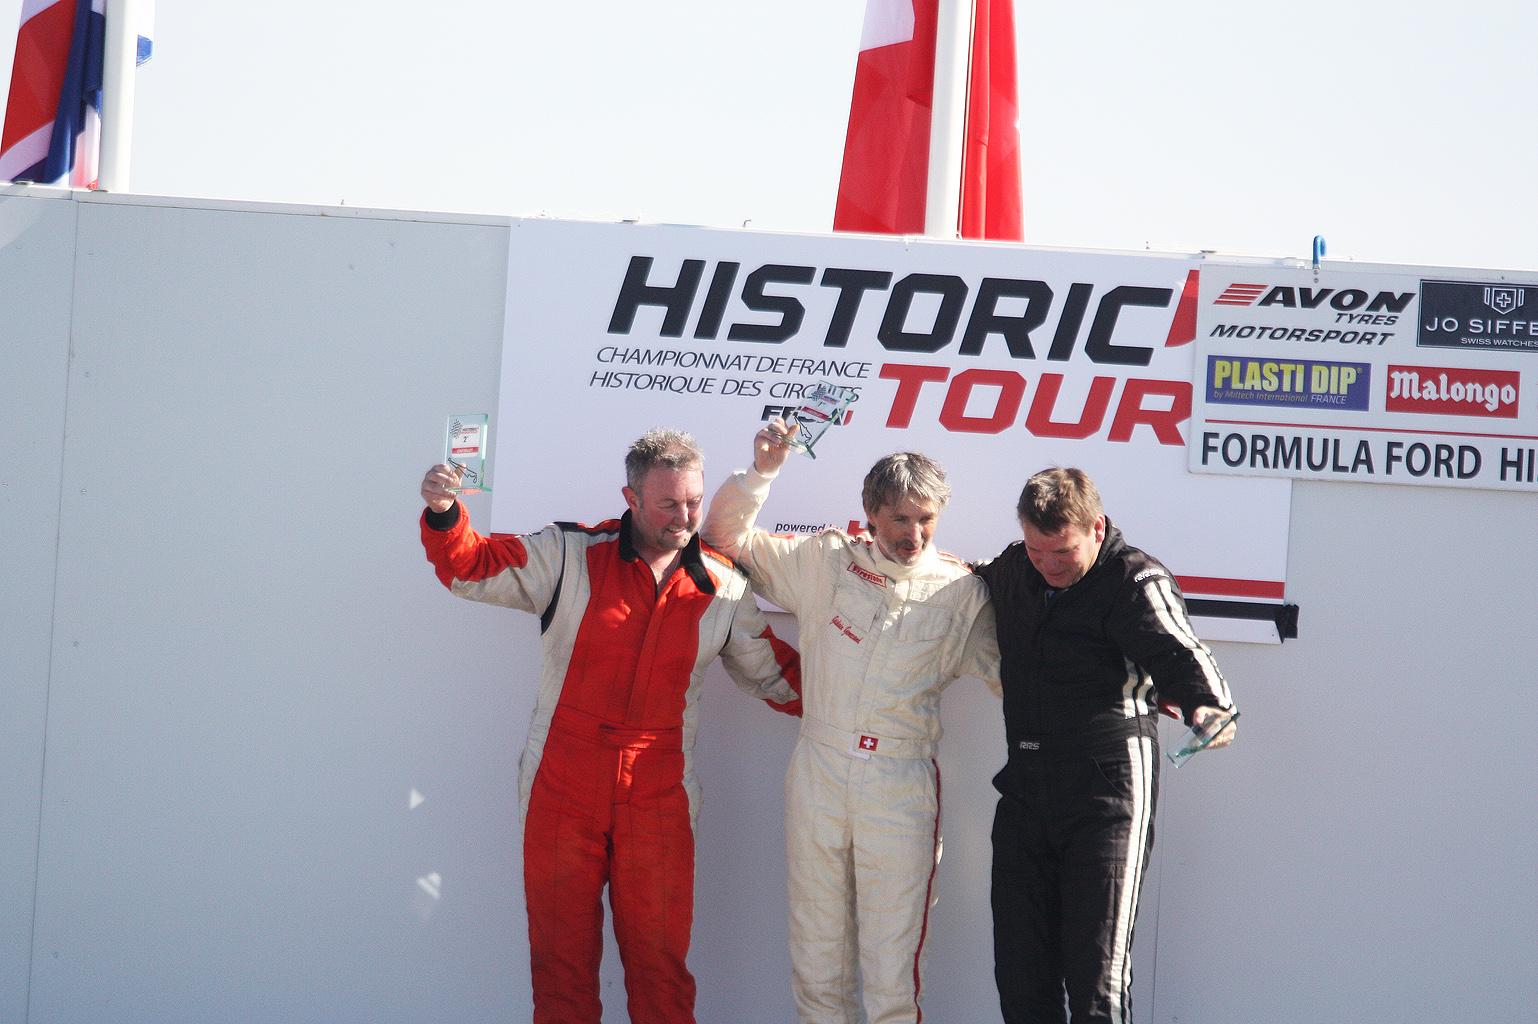 Podium Challenge Motul : Mike Gardner (2nd) - Gislain Genécand (1er) - François Belle (3ème)